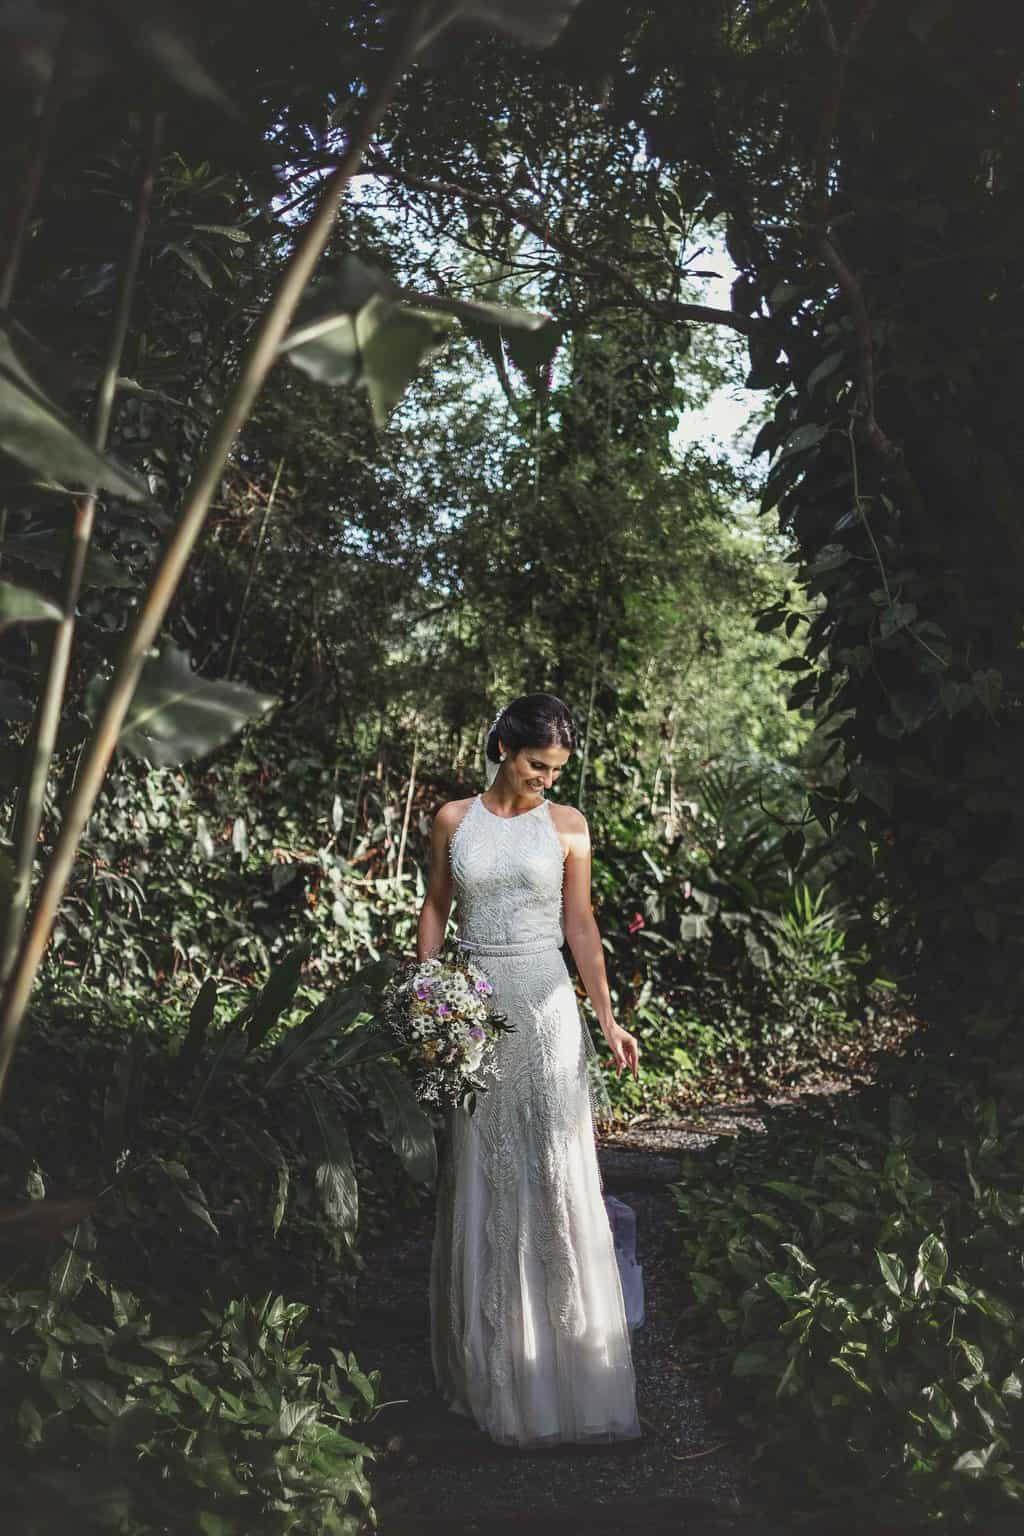 casamento-Ana-Cecilia-e-Leonardo-casamento-na-serra-graviola-filmes-graviolafilmes-laura-camapnella-de-siervi-lauracampanella-studio-laura-camapnella50